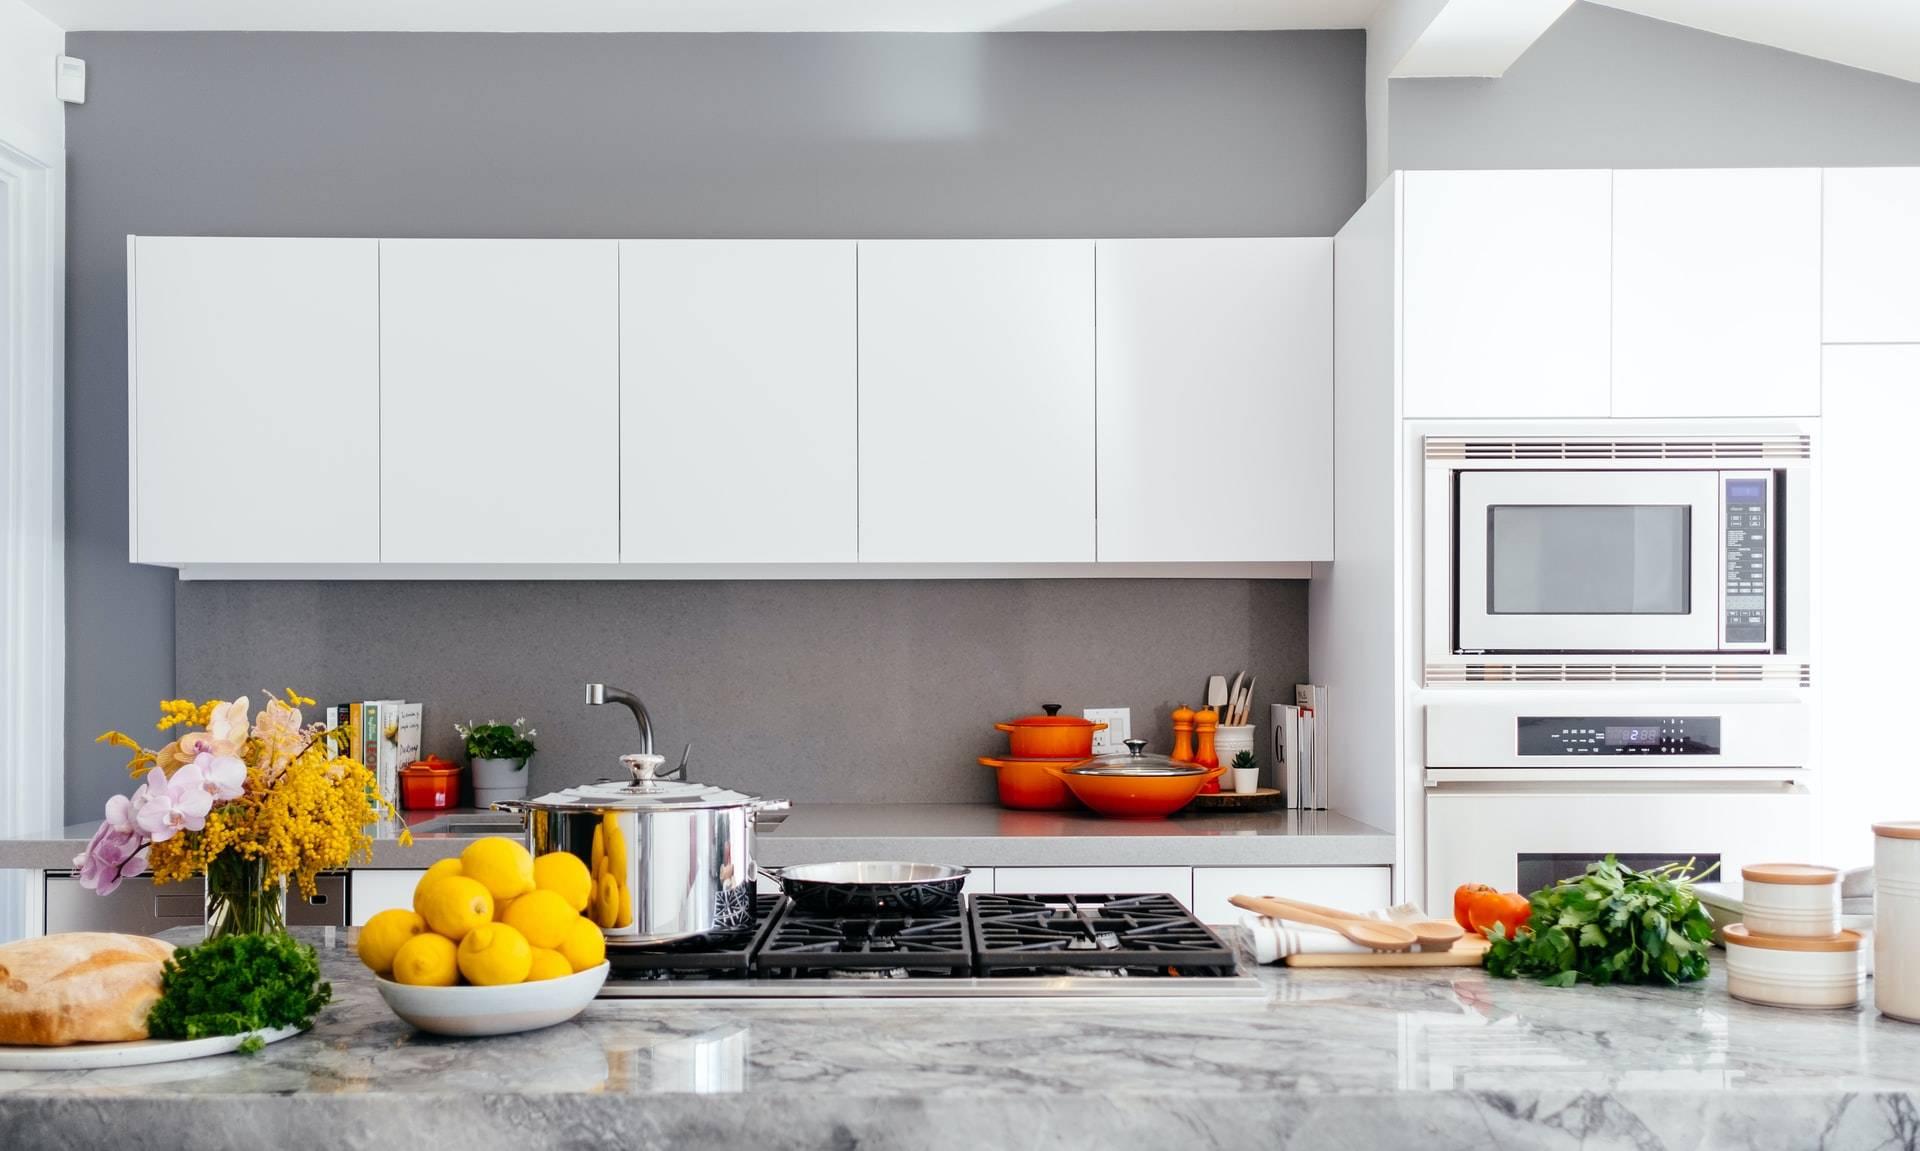 Home Improvement Companies Need Renovation Prospects